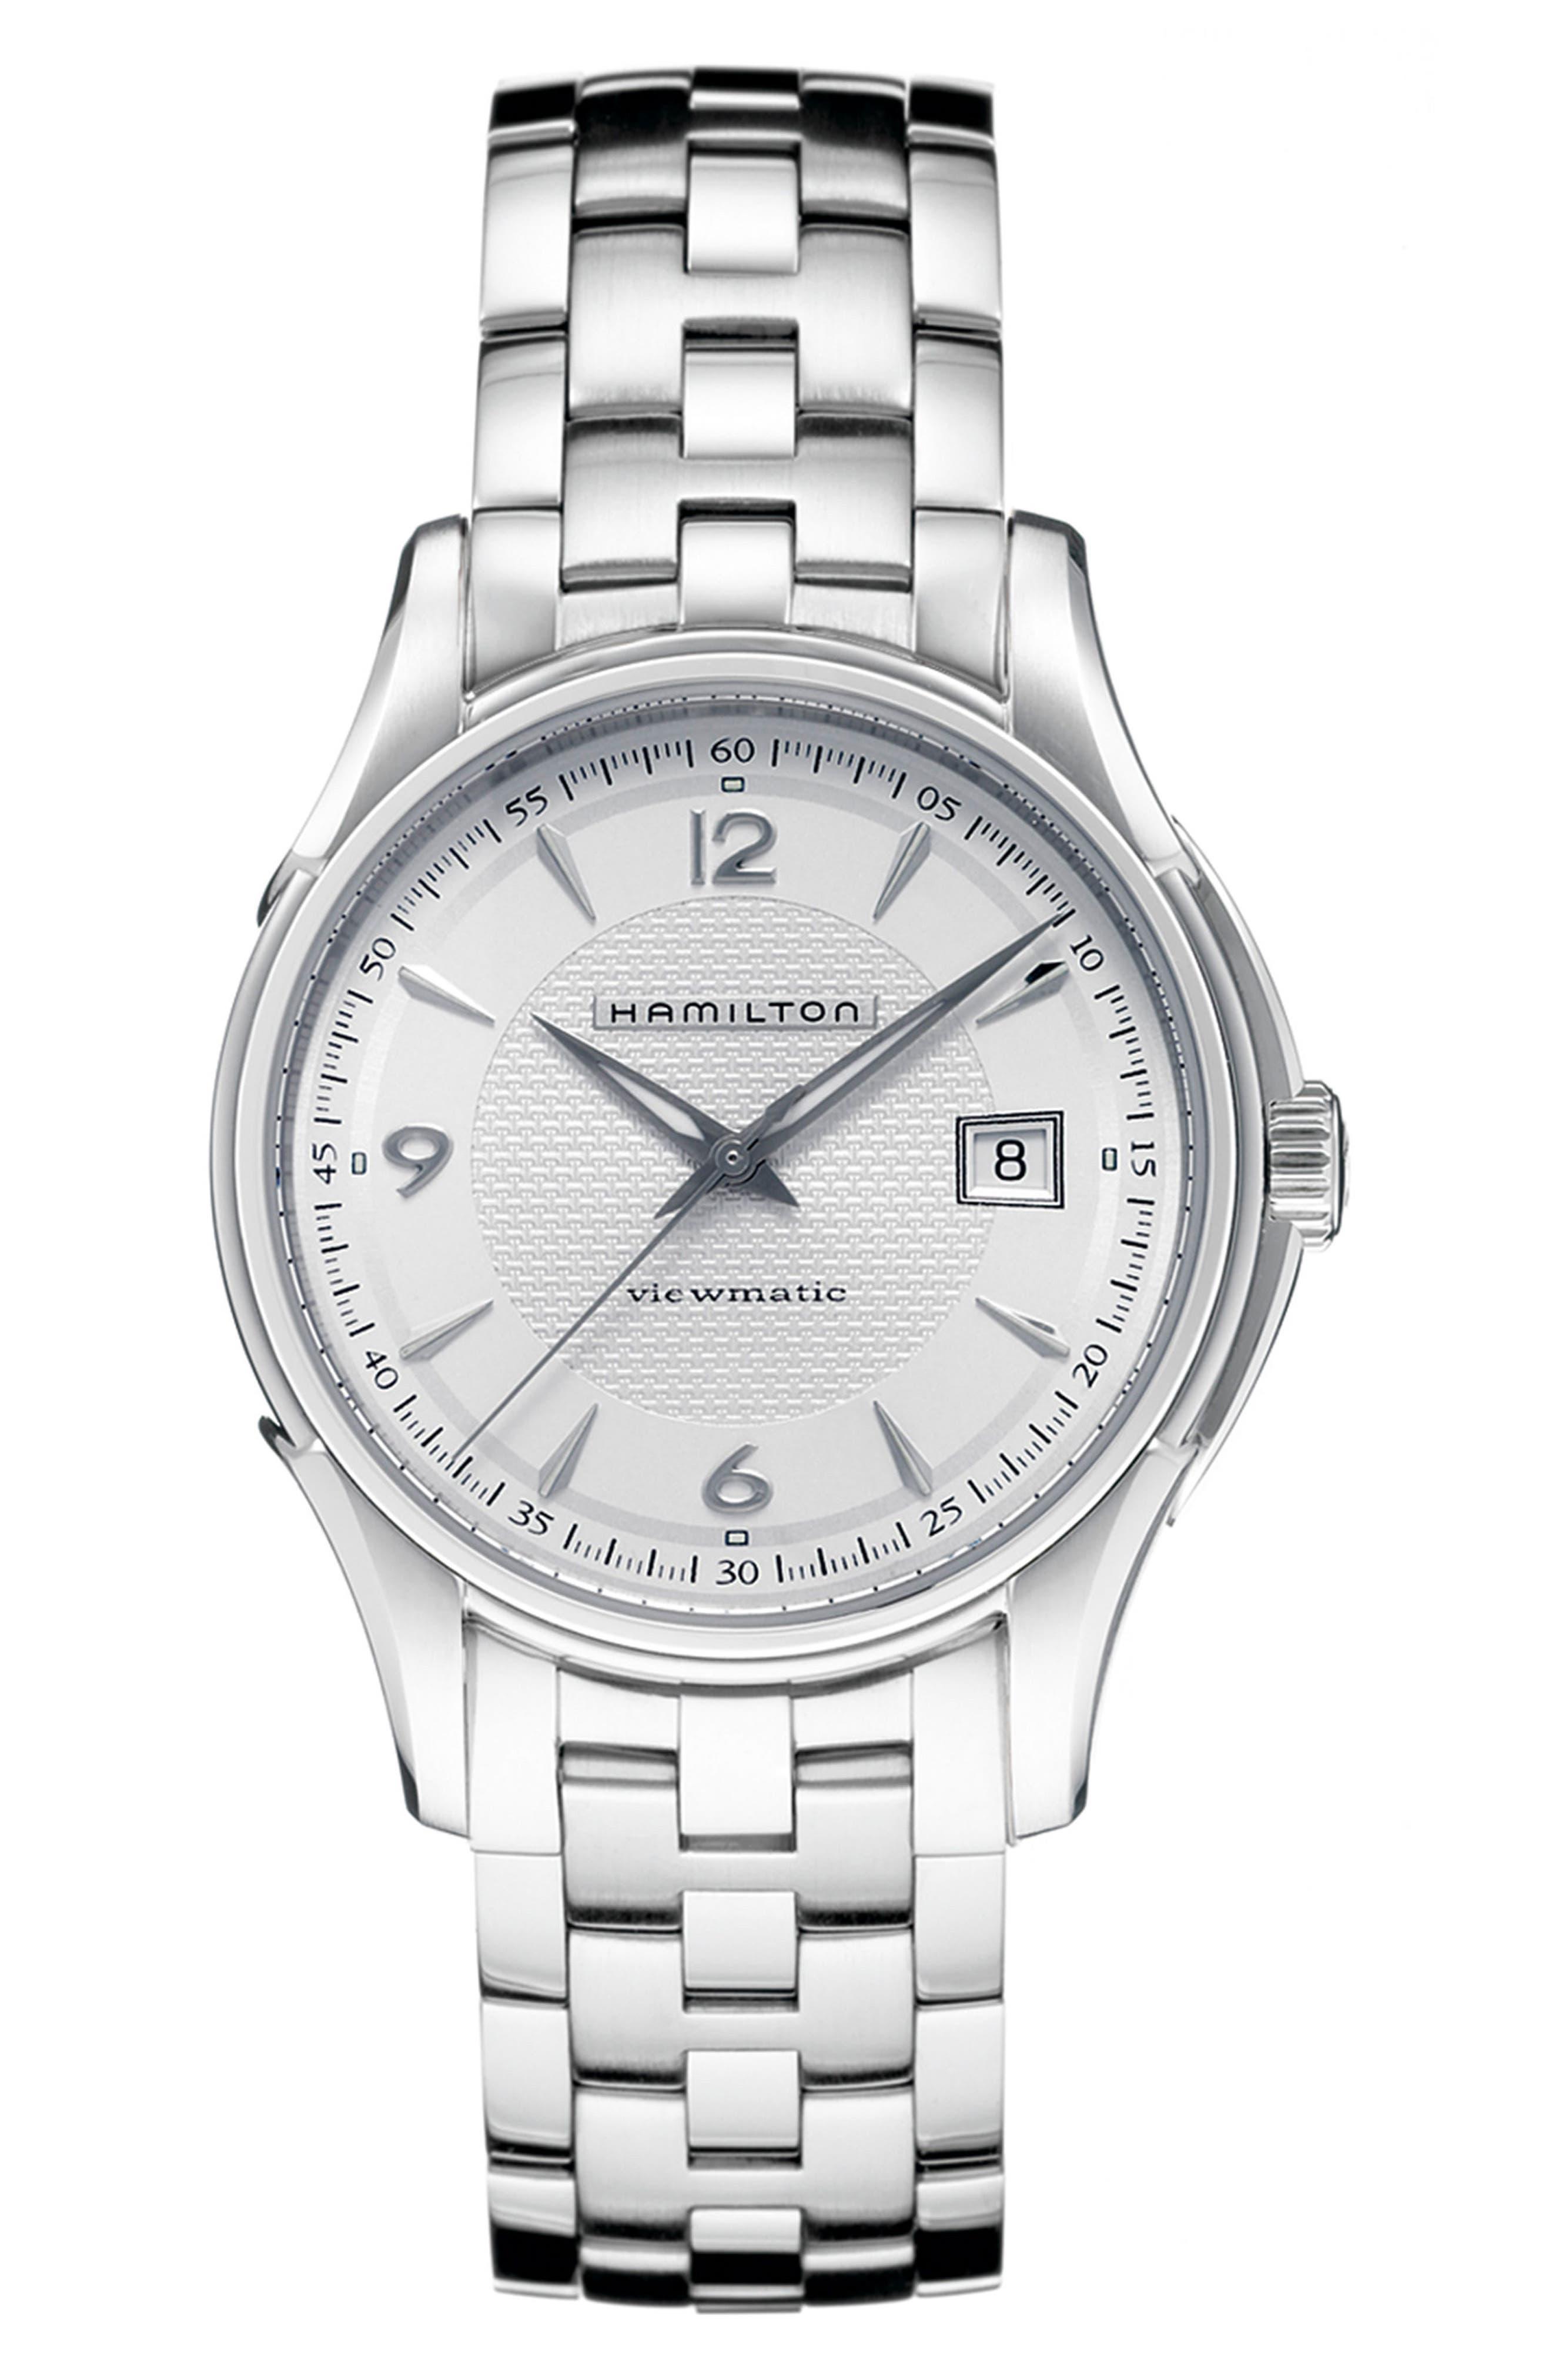 Alternate Image 1 Selected - Hamilton Jazzmaster Viewmatic Auto Bracelet Watch, 40mm